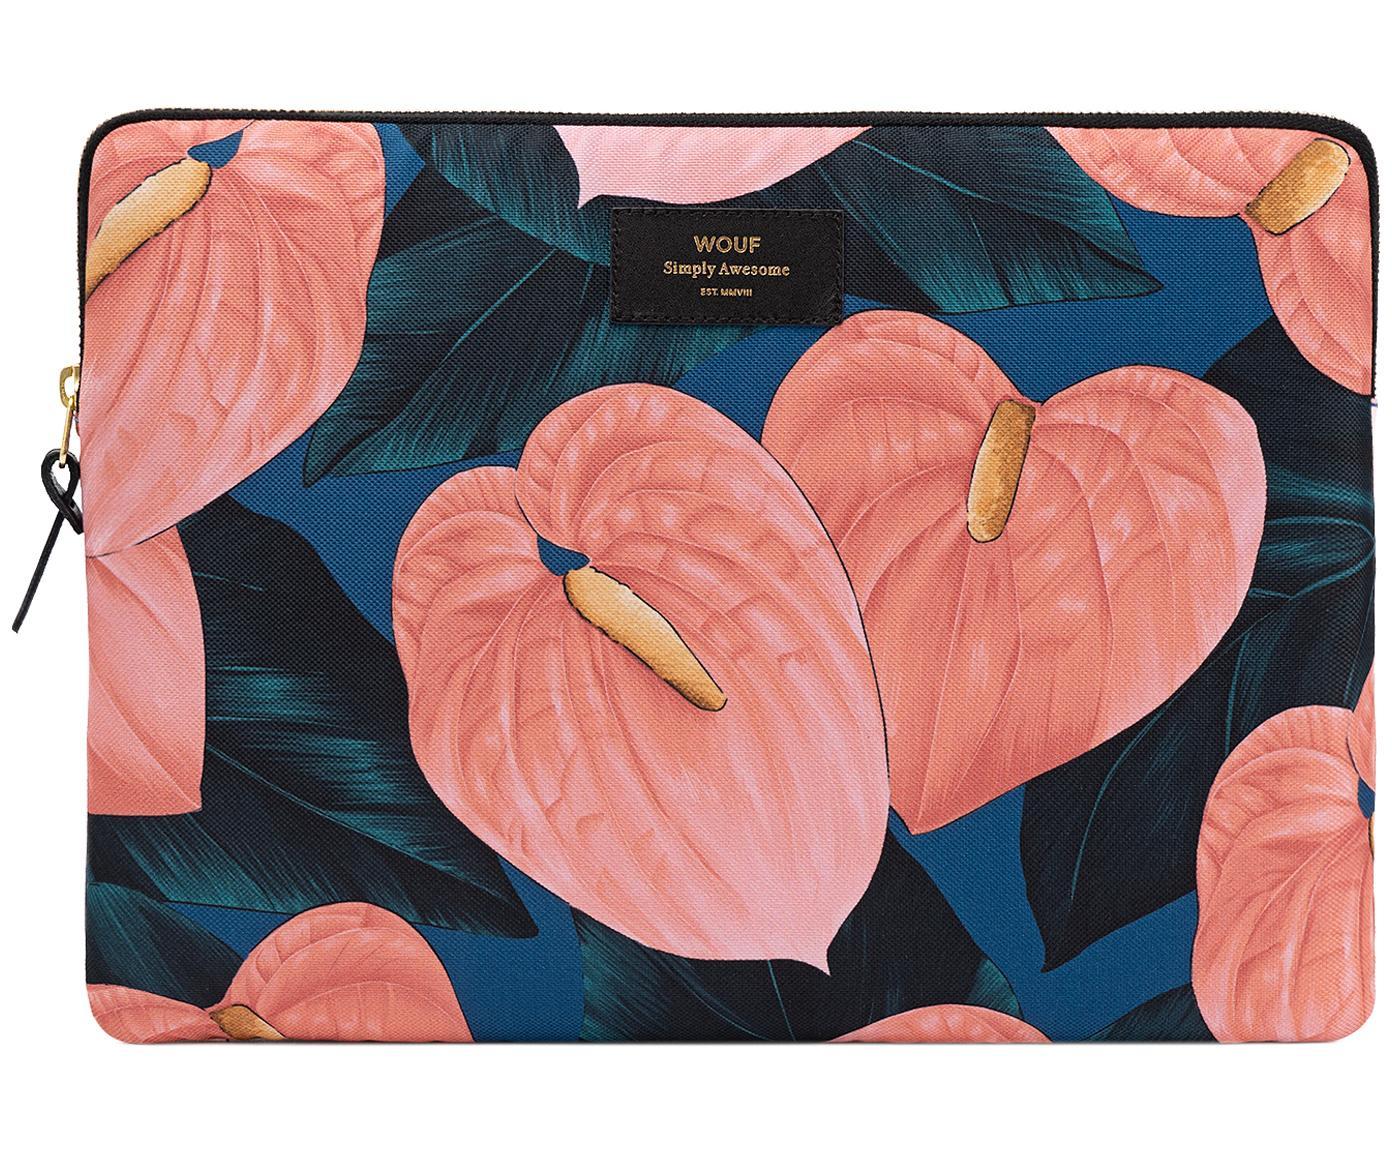 Laptophülle Lily für MacBook Pro 13 Zoll, Mehrfarbig, 33 x 23 cm